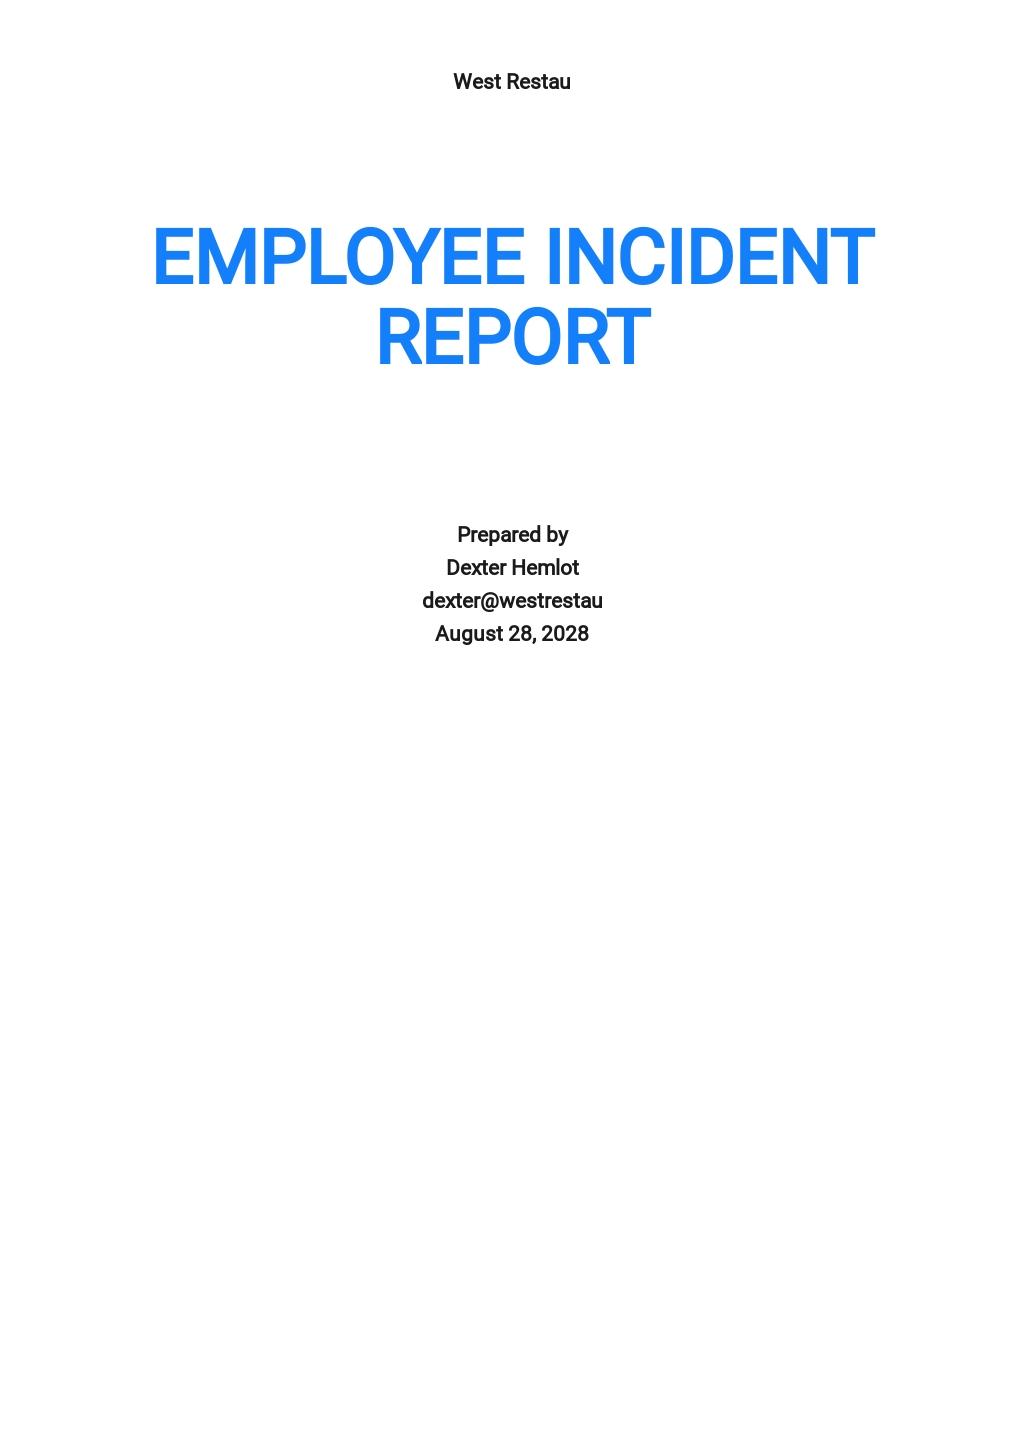 Employee Incident Report Template.jpe